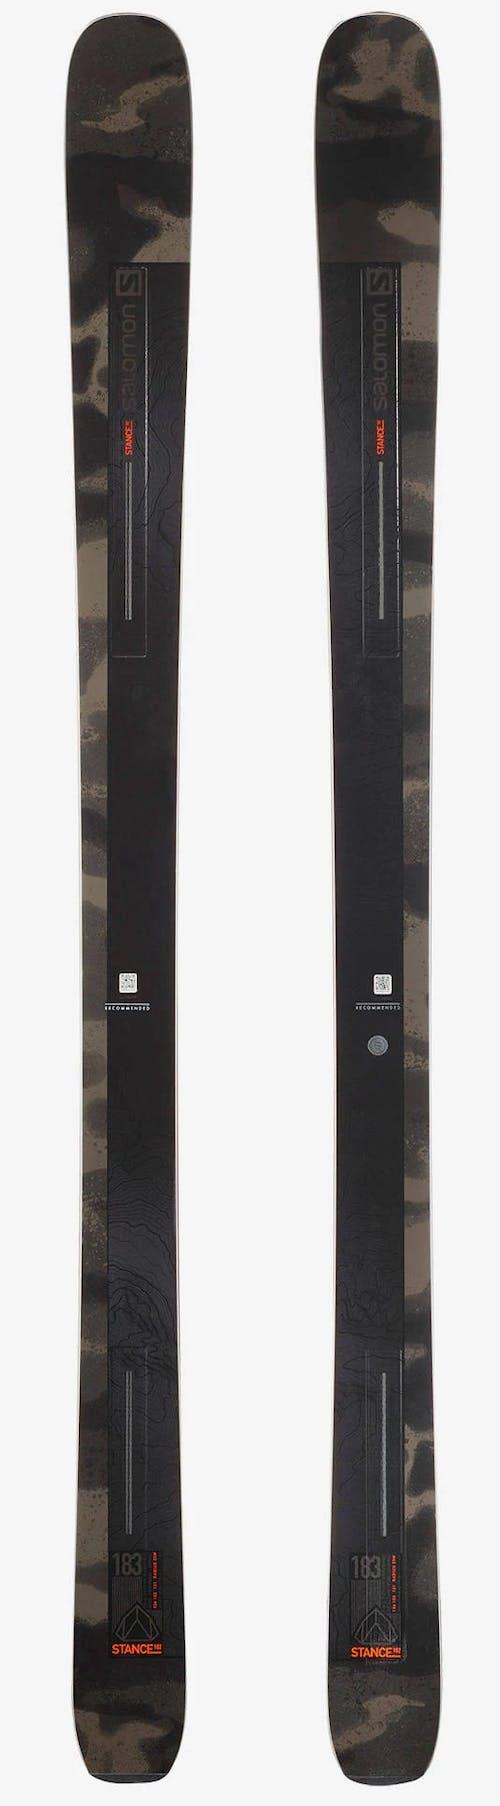 Salomon Stance 102 Skis